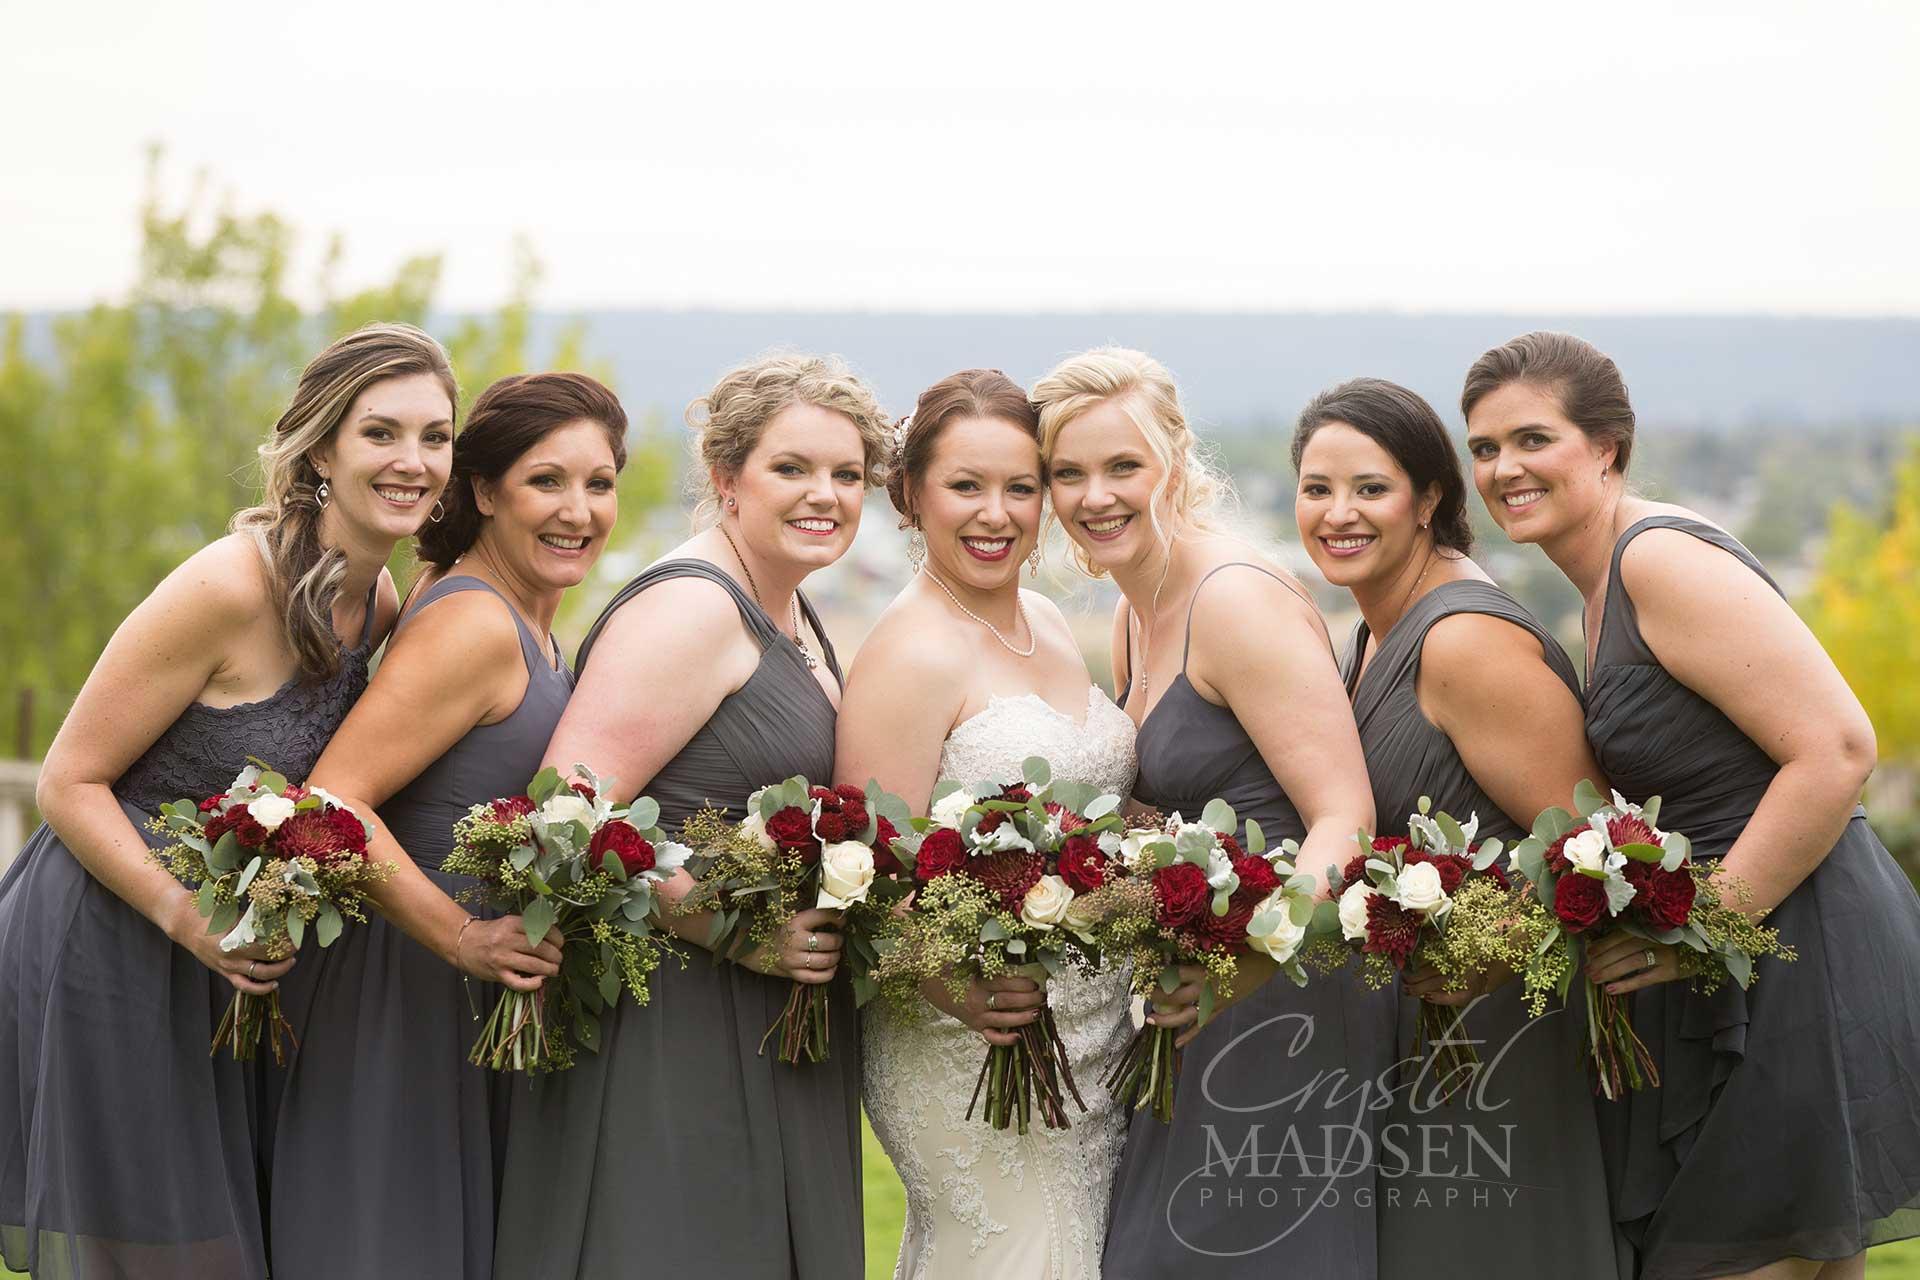 Bridesmaids in spokane